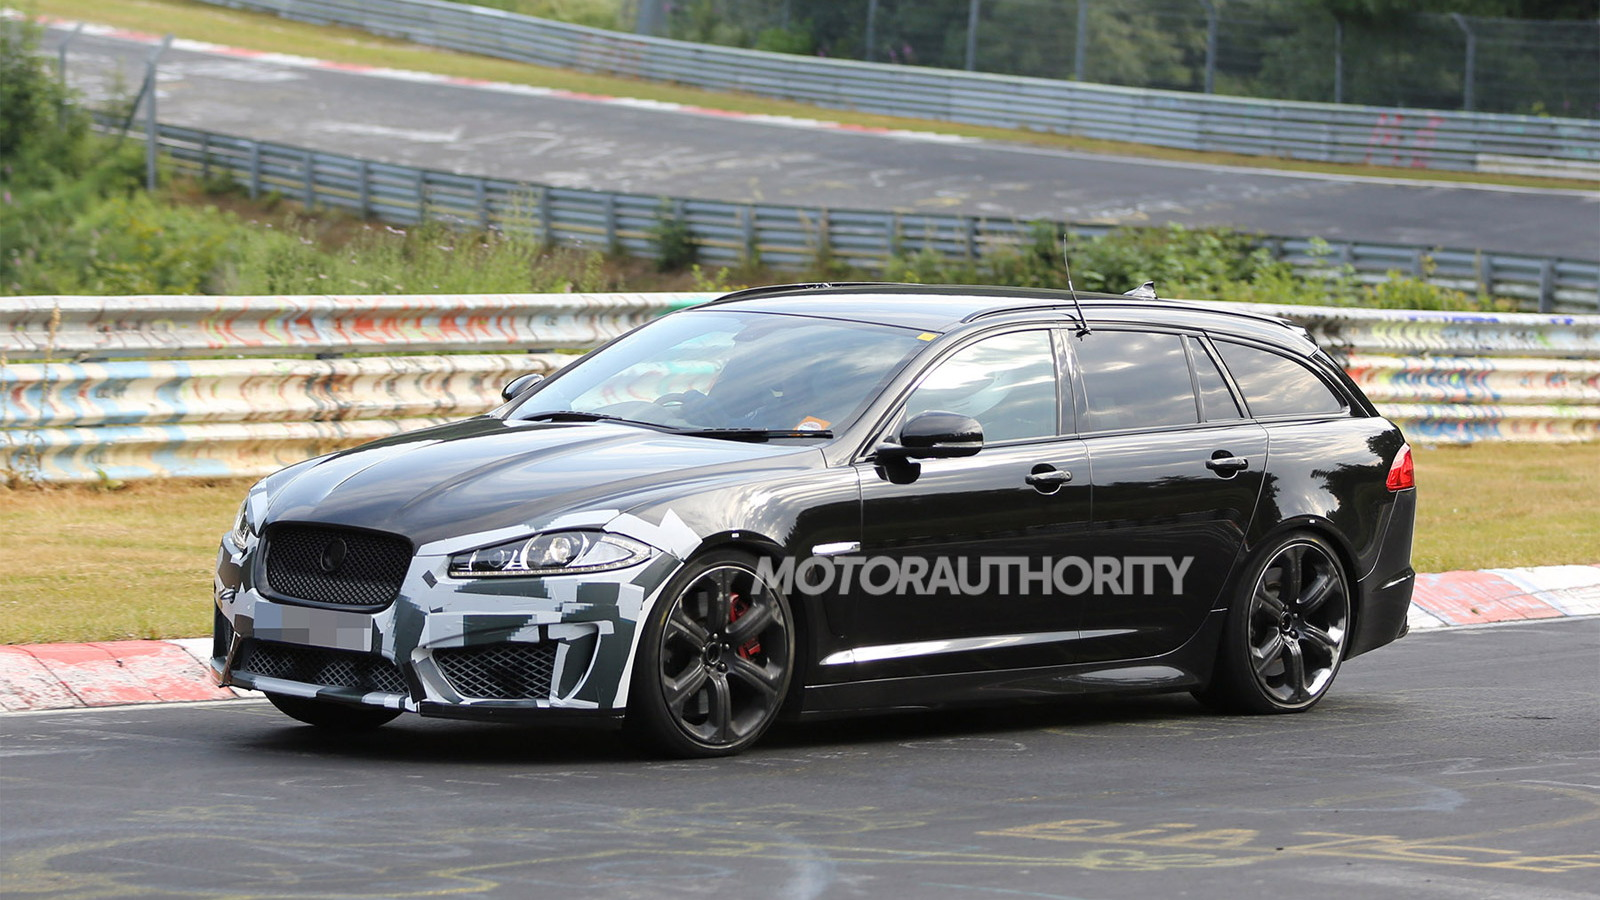 2014 Jaguar XFR-S Sportbrake spy shots